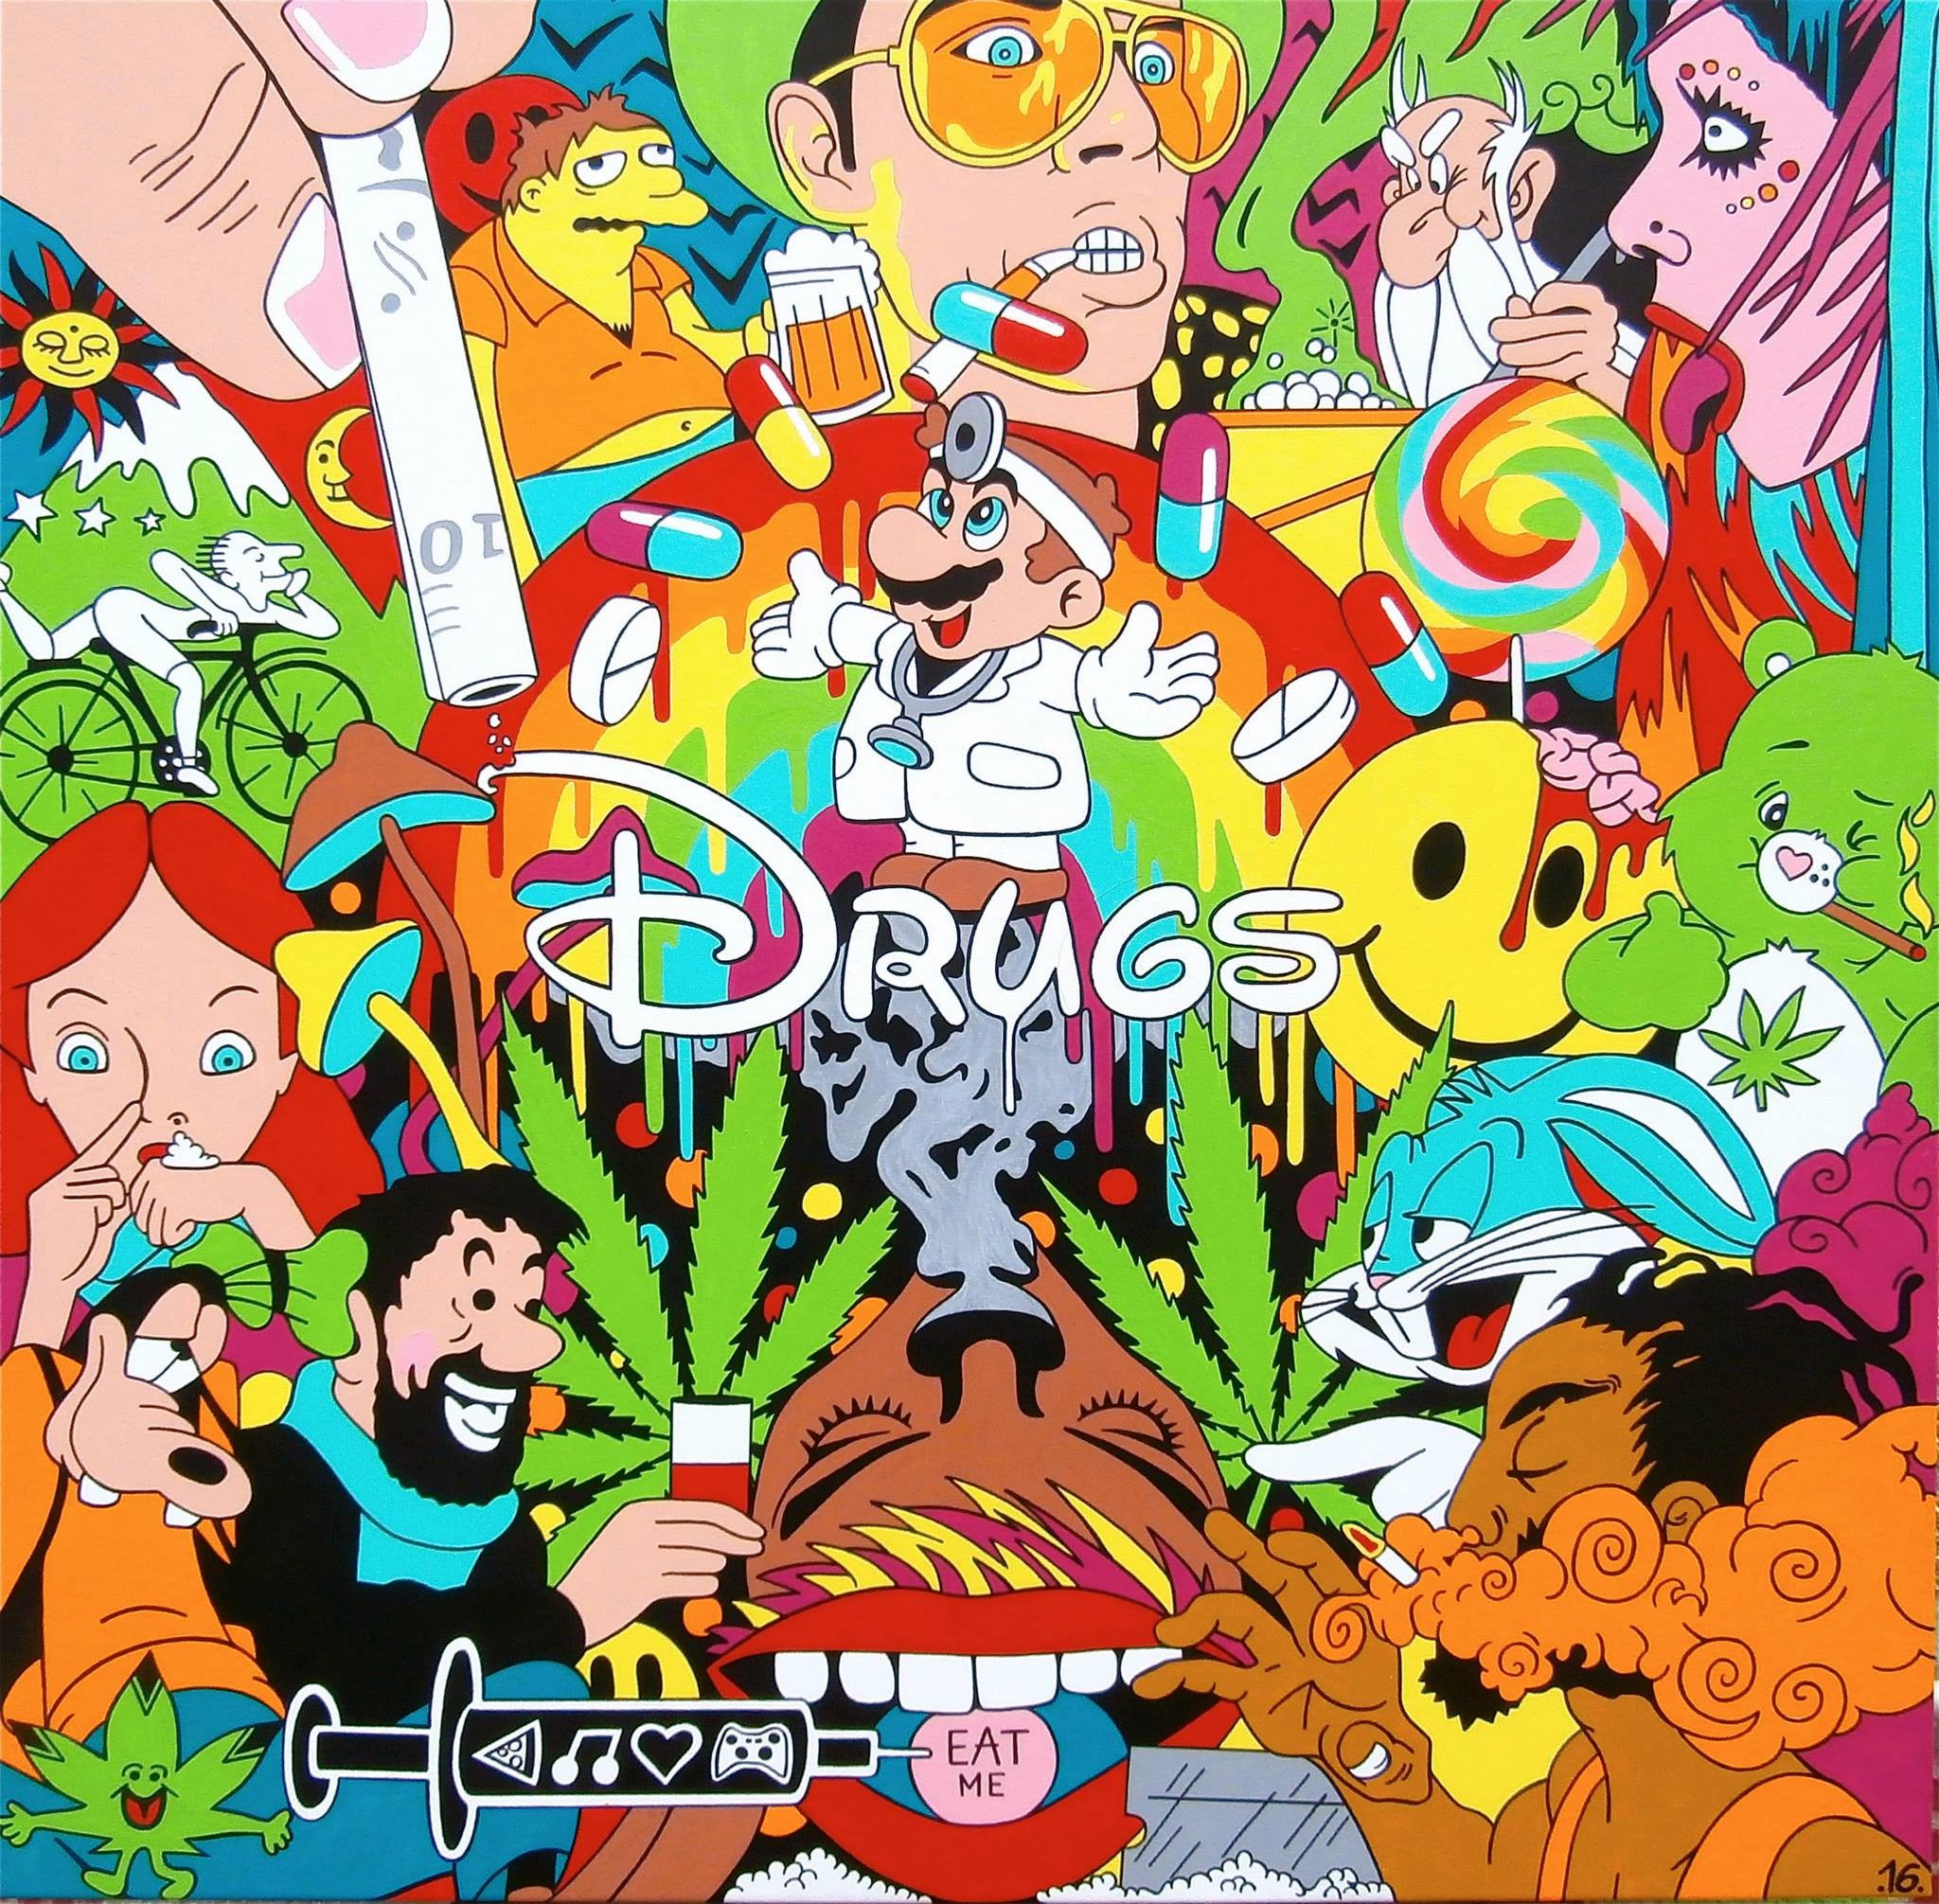 trippy disney cocaine drugs weed lsd bugs bunny acid trip ariel mario Super  Mario fear and loathing in las vegas smoke weed speed meth mdma acid trip  lsd …